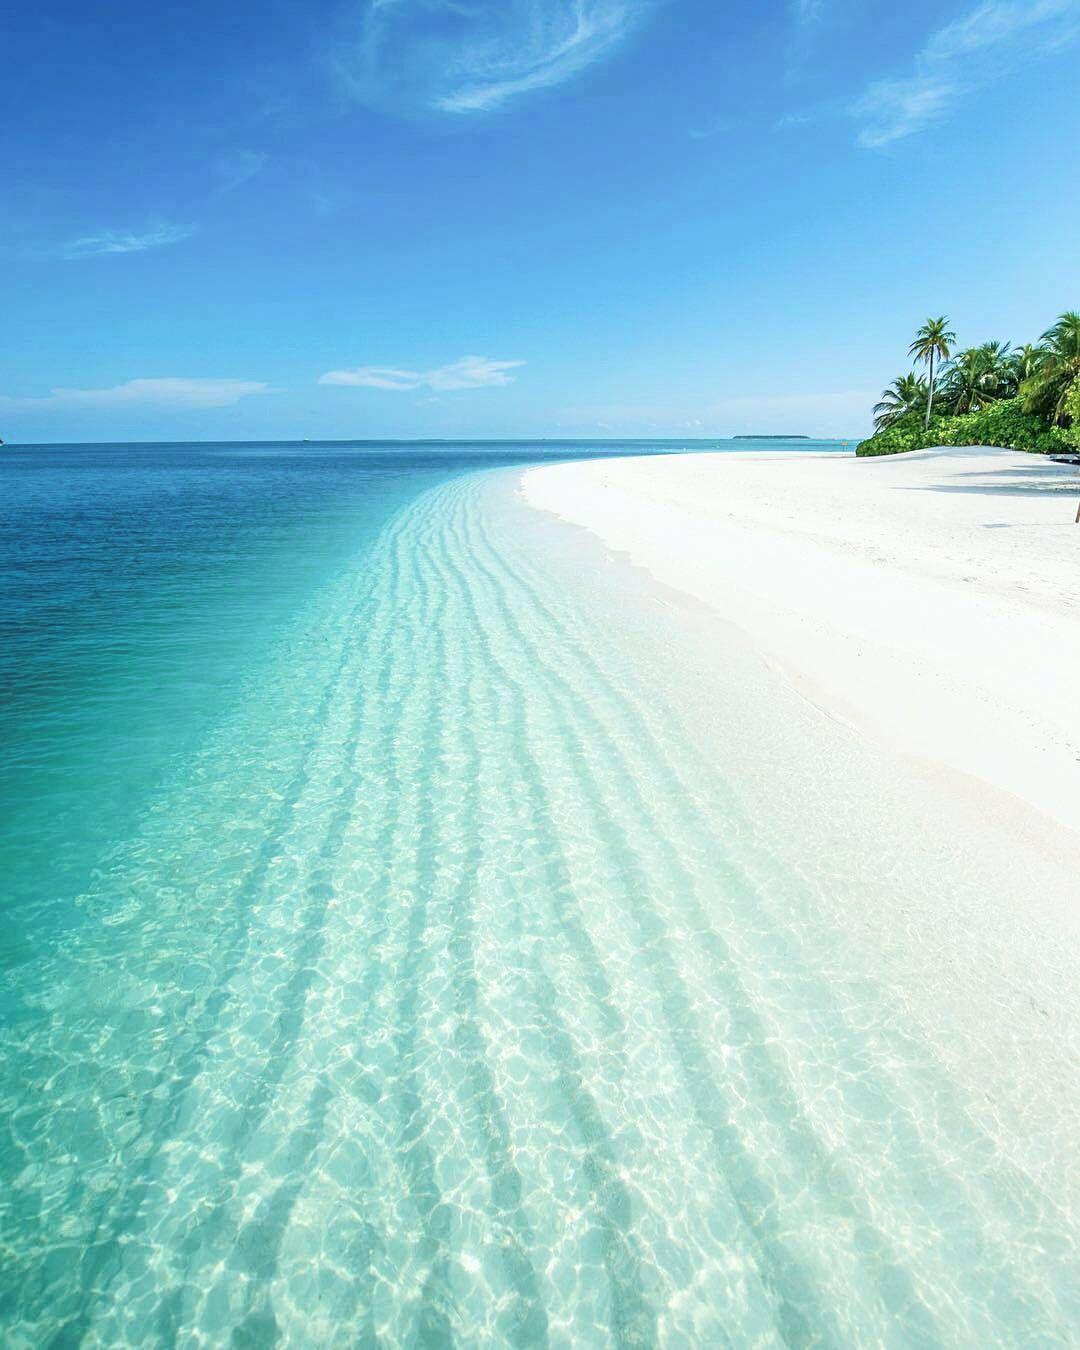 Maldives Beach: The Maldives Islands #Maldives #MaldivesPins